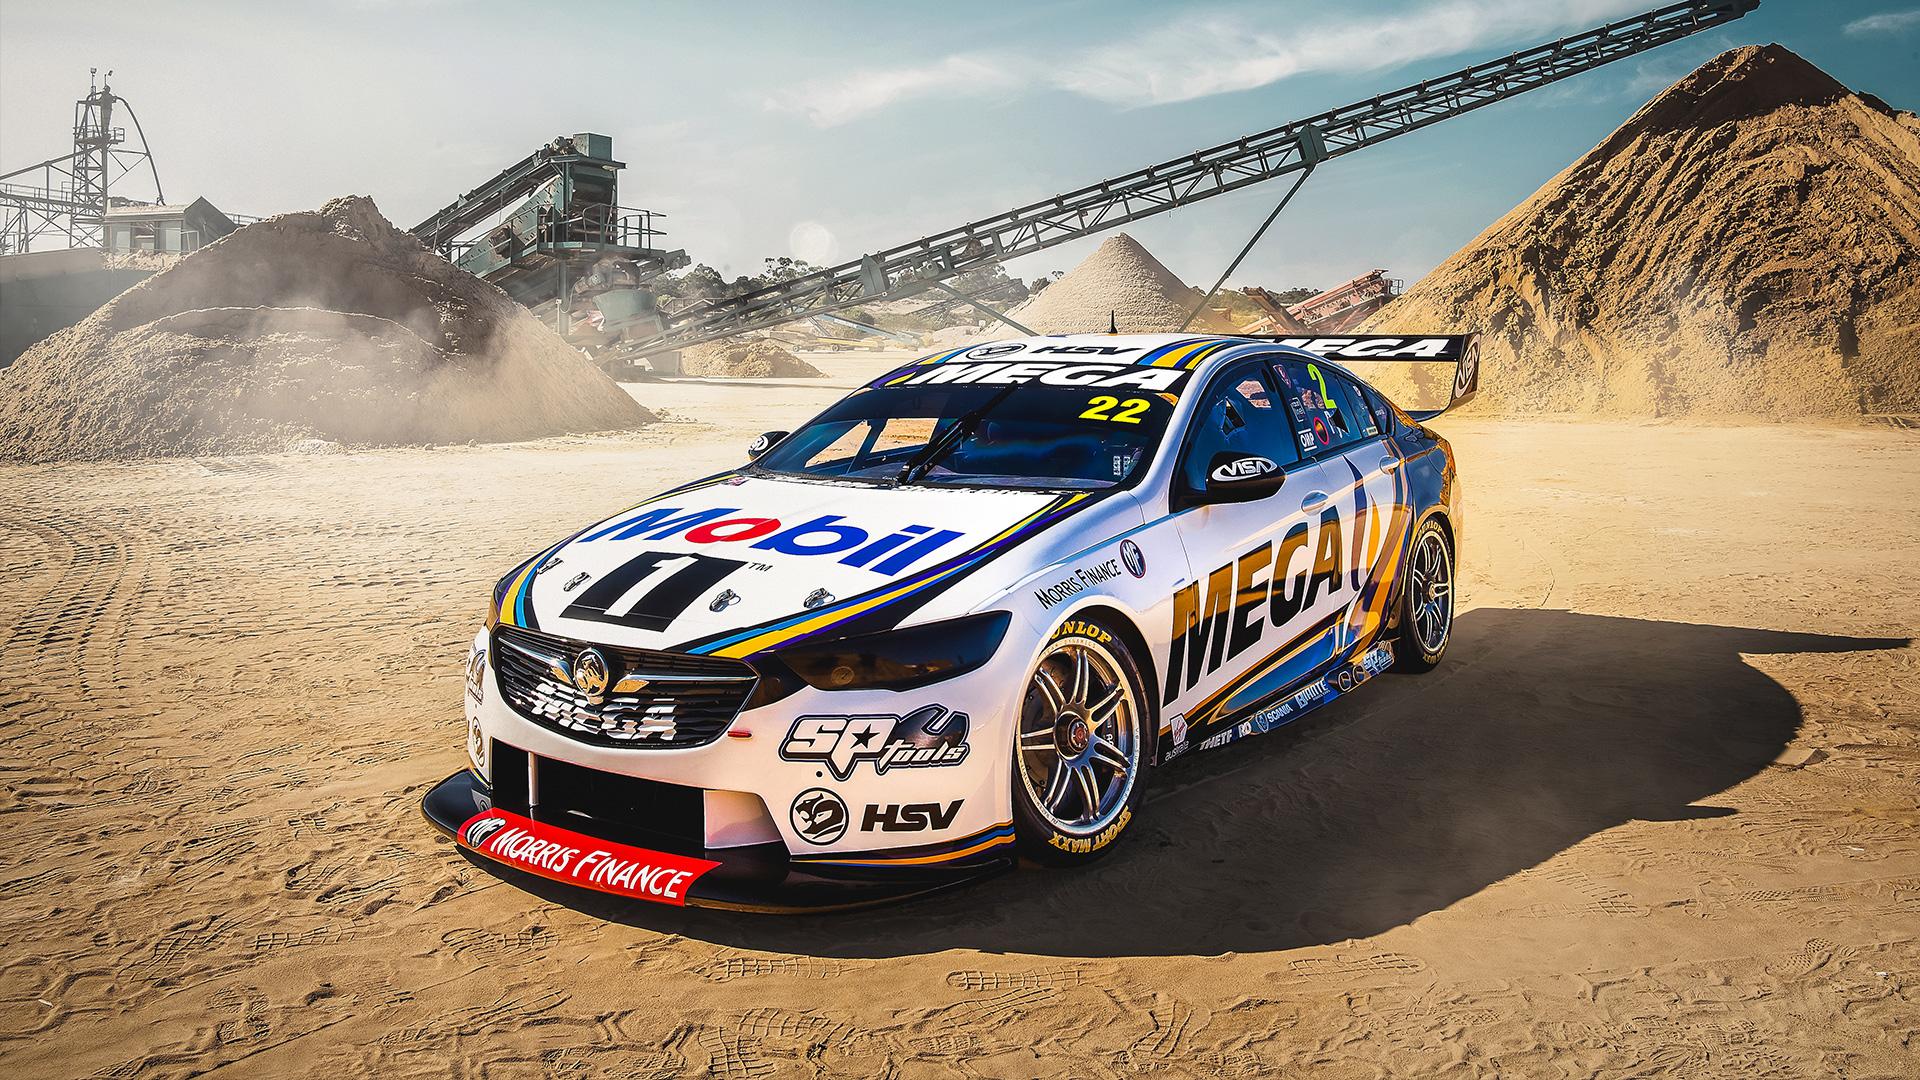 Mobil1 MEGA Supercar Racing Team